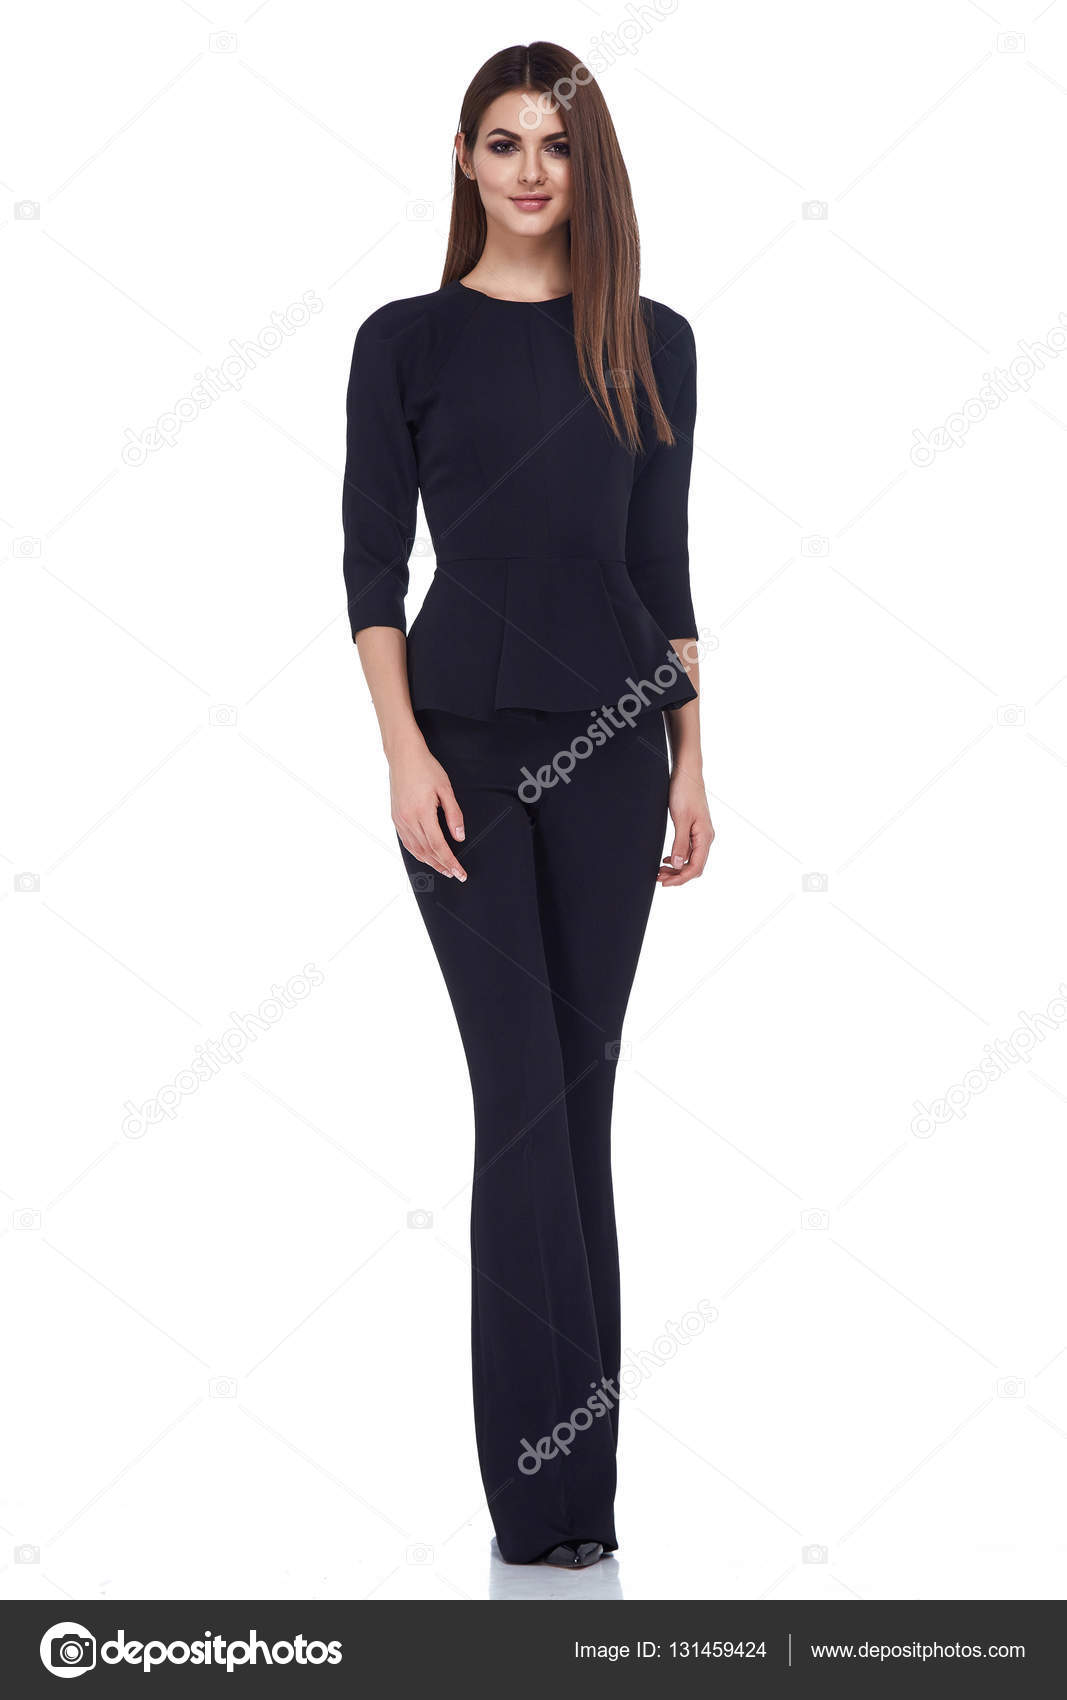 Mode Stil Frau perfekten Körper Form brünette Haare tragen schwarz ...